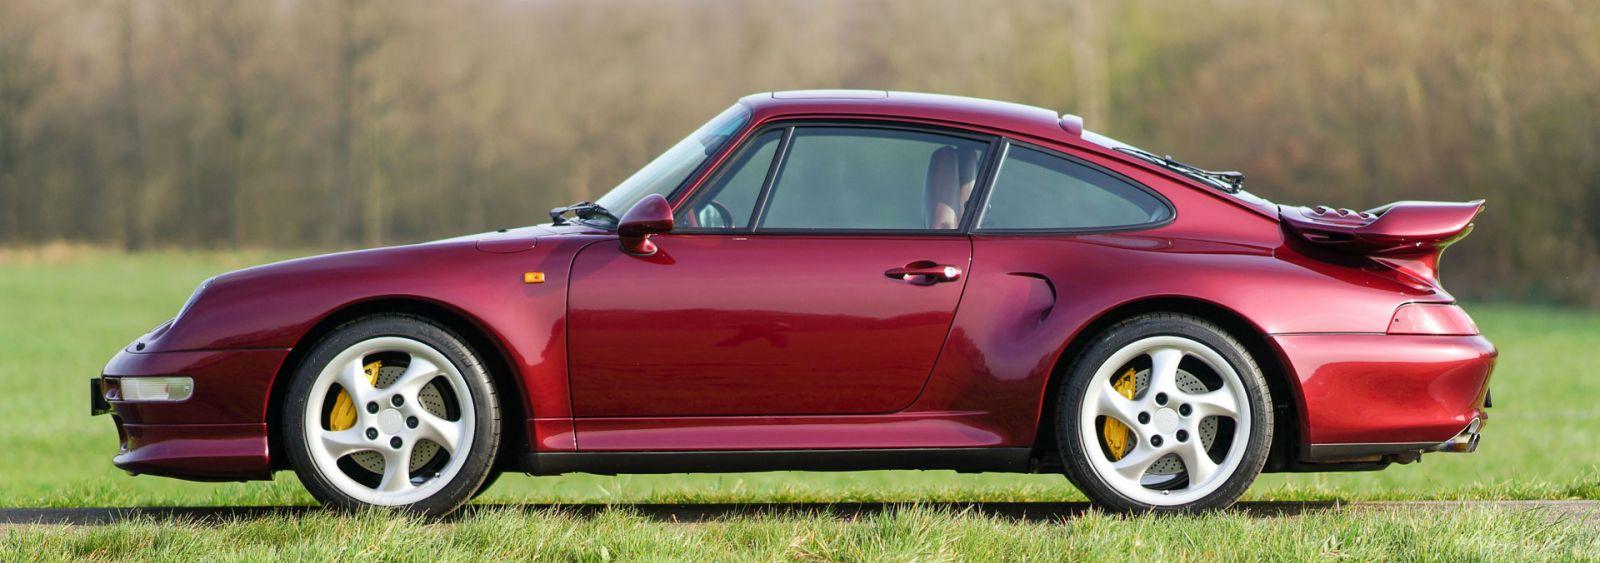 Porsche 911 (993) Turbo S, 1997